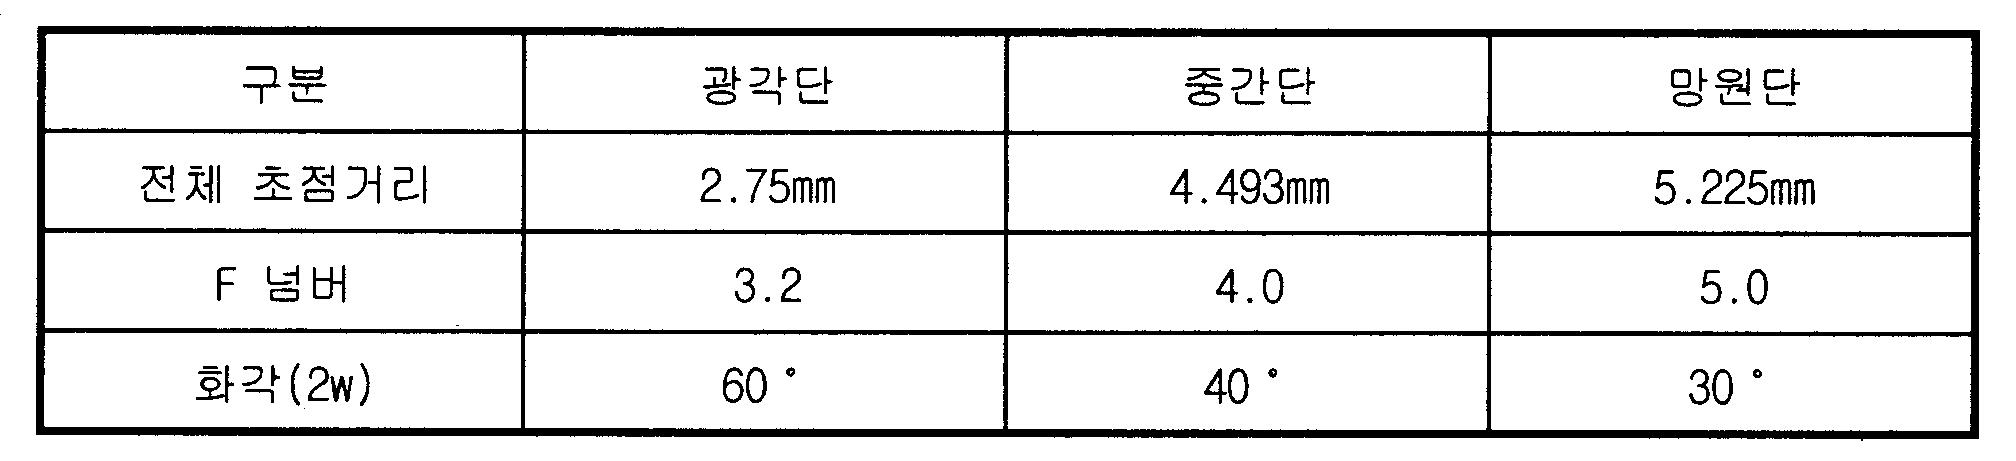 Figure 112006027430332-pat00012